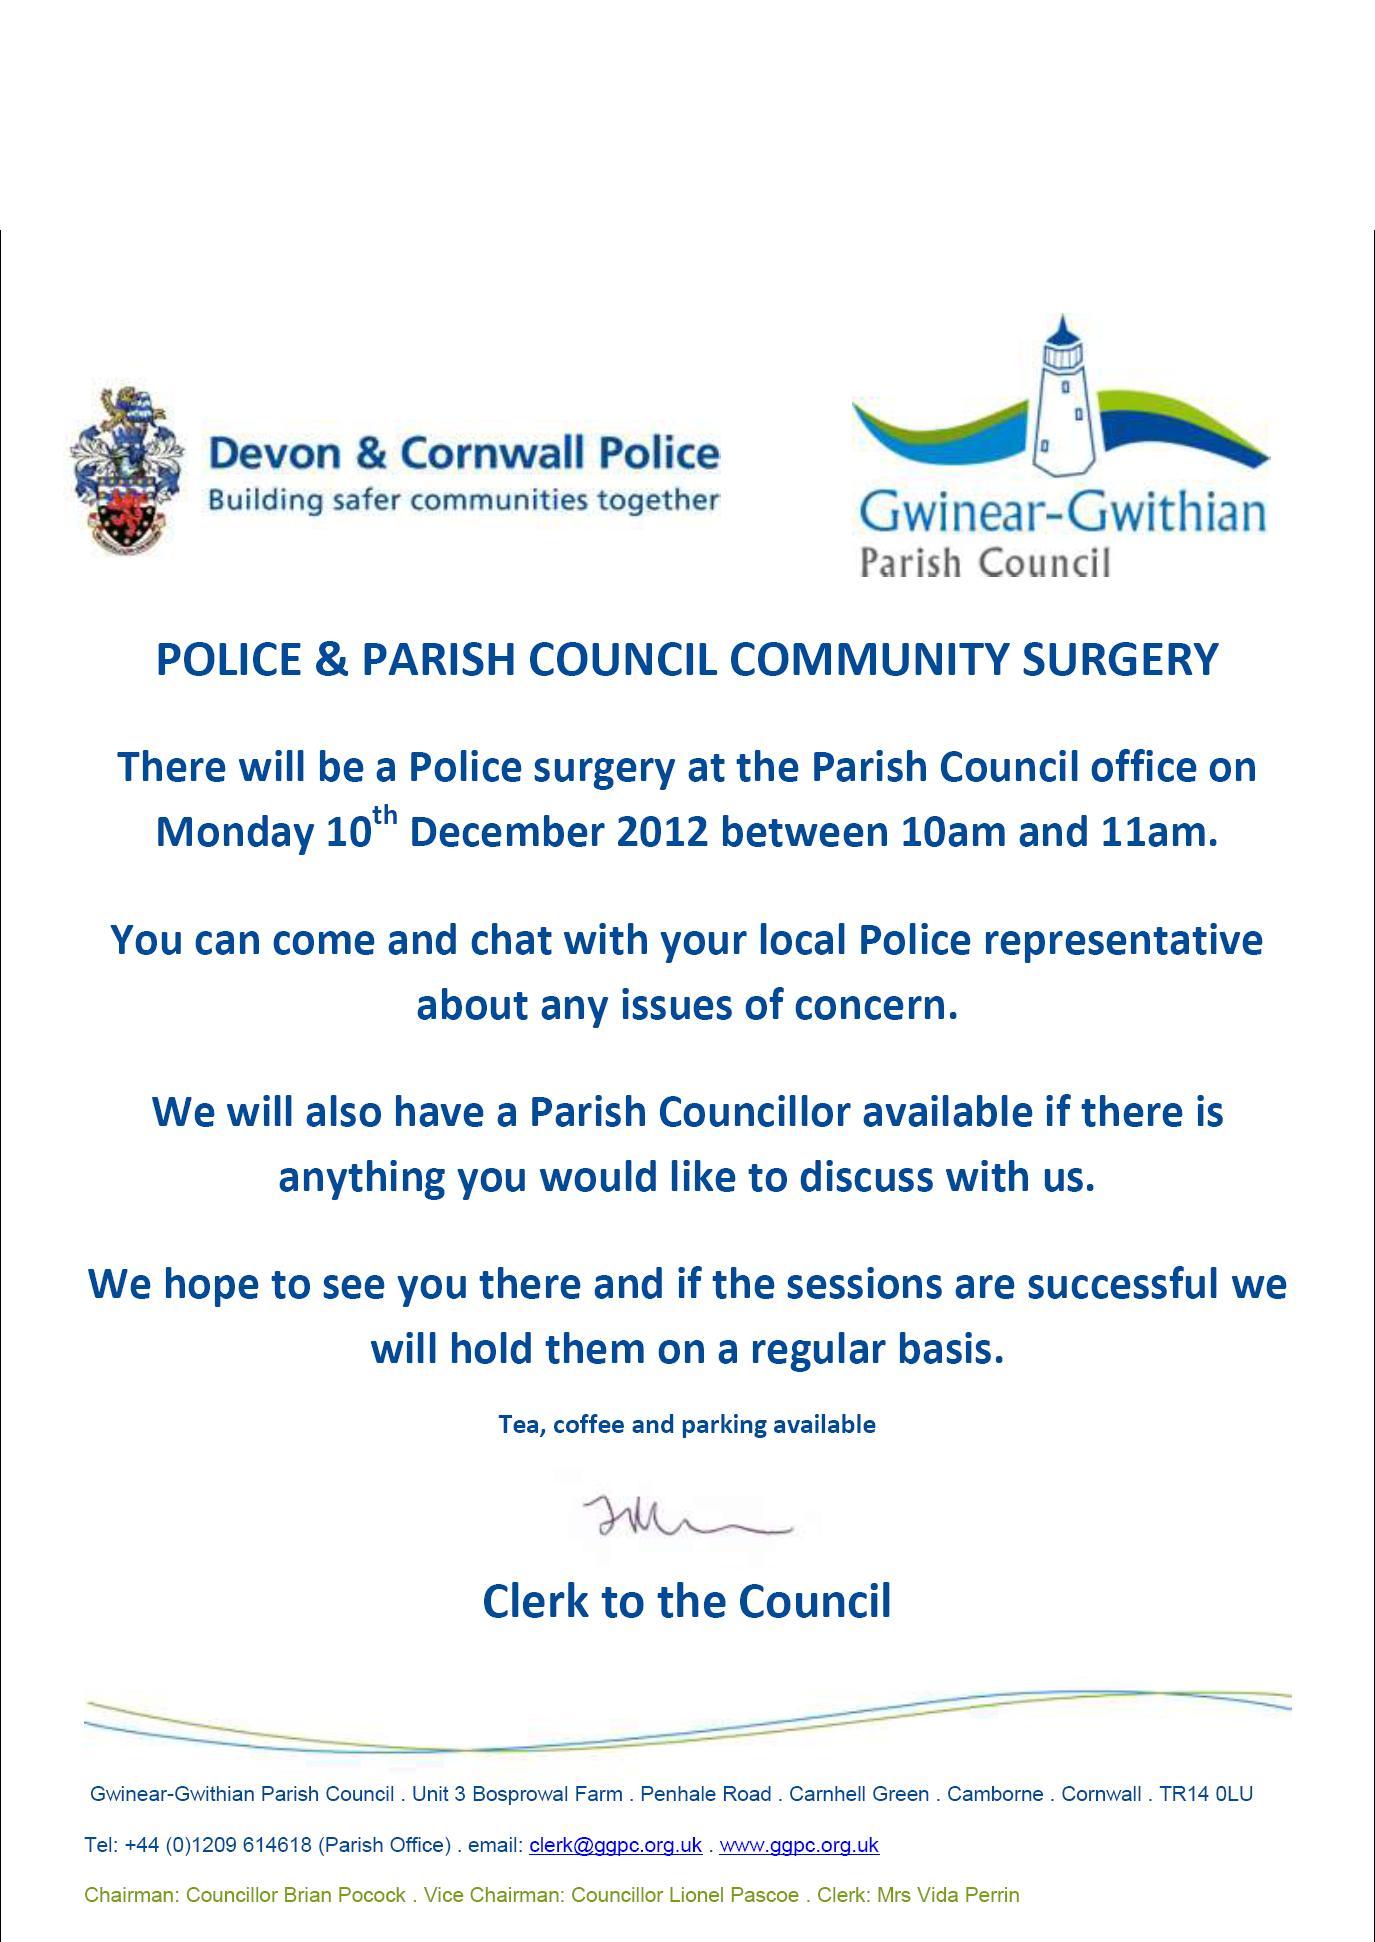 Police & Parish Council surgery event – Monday 10th December 2012 10-11am at the Parish Office